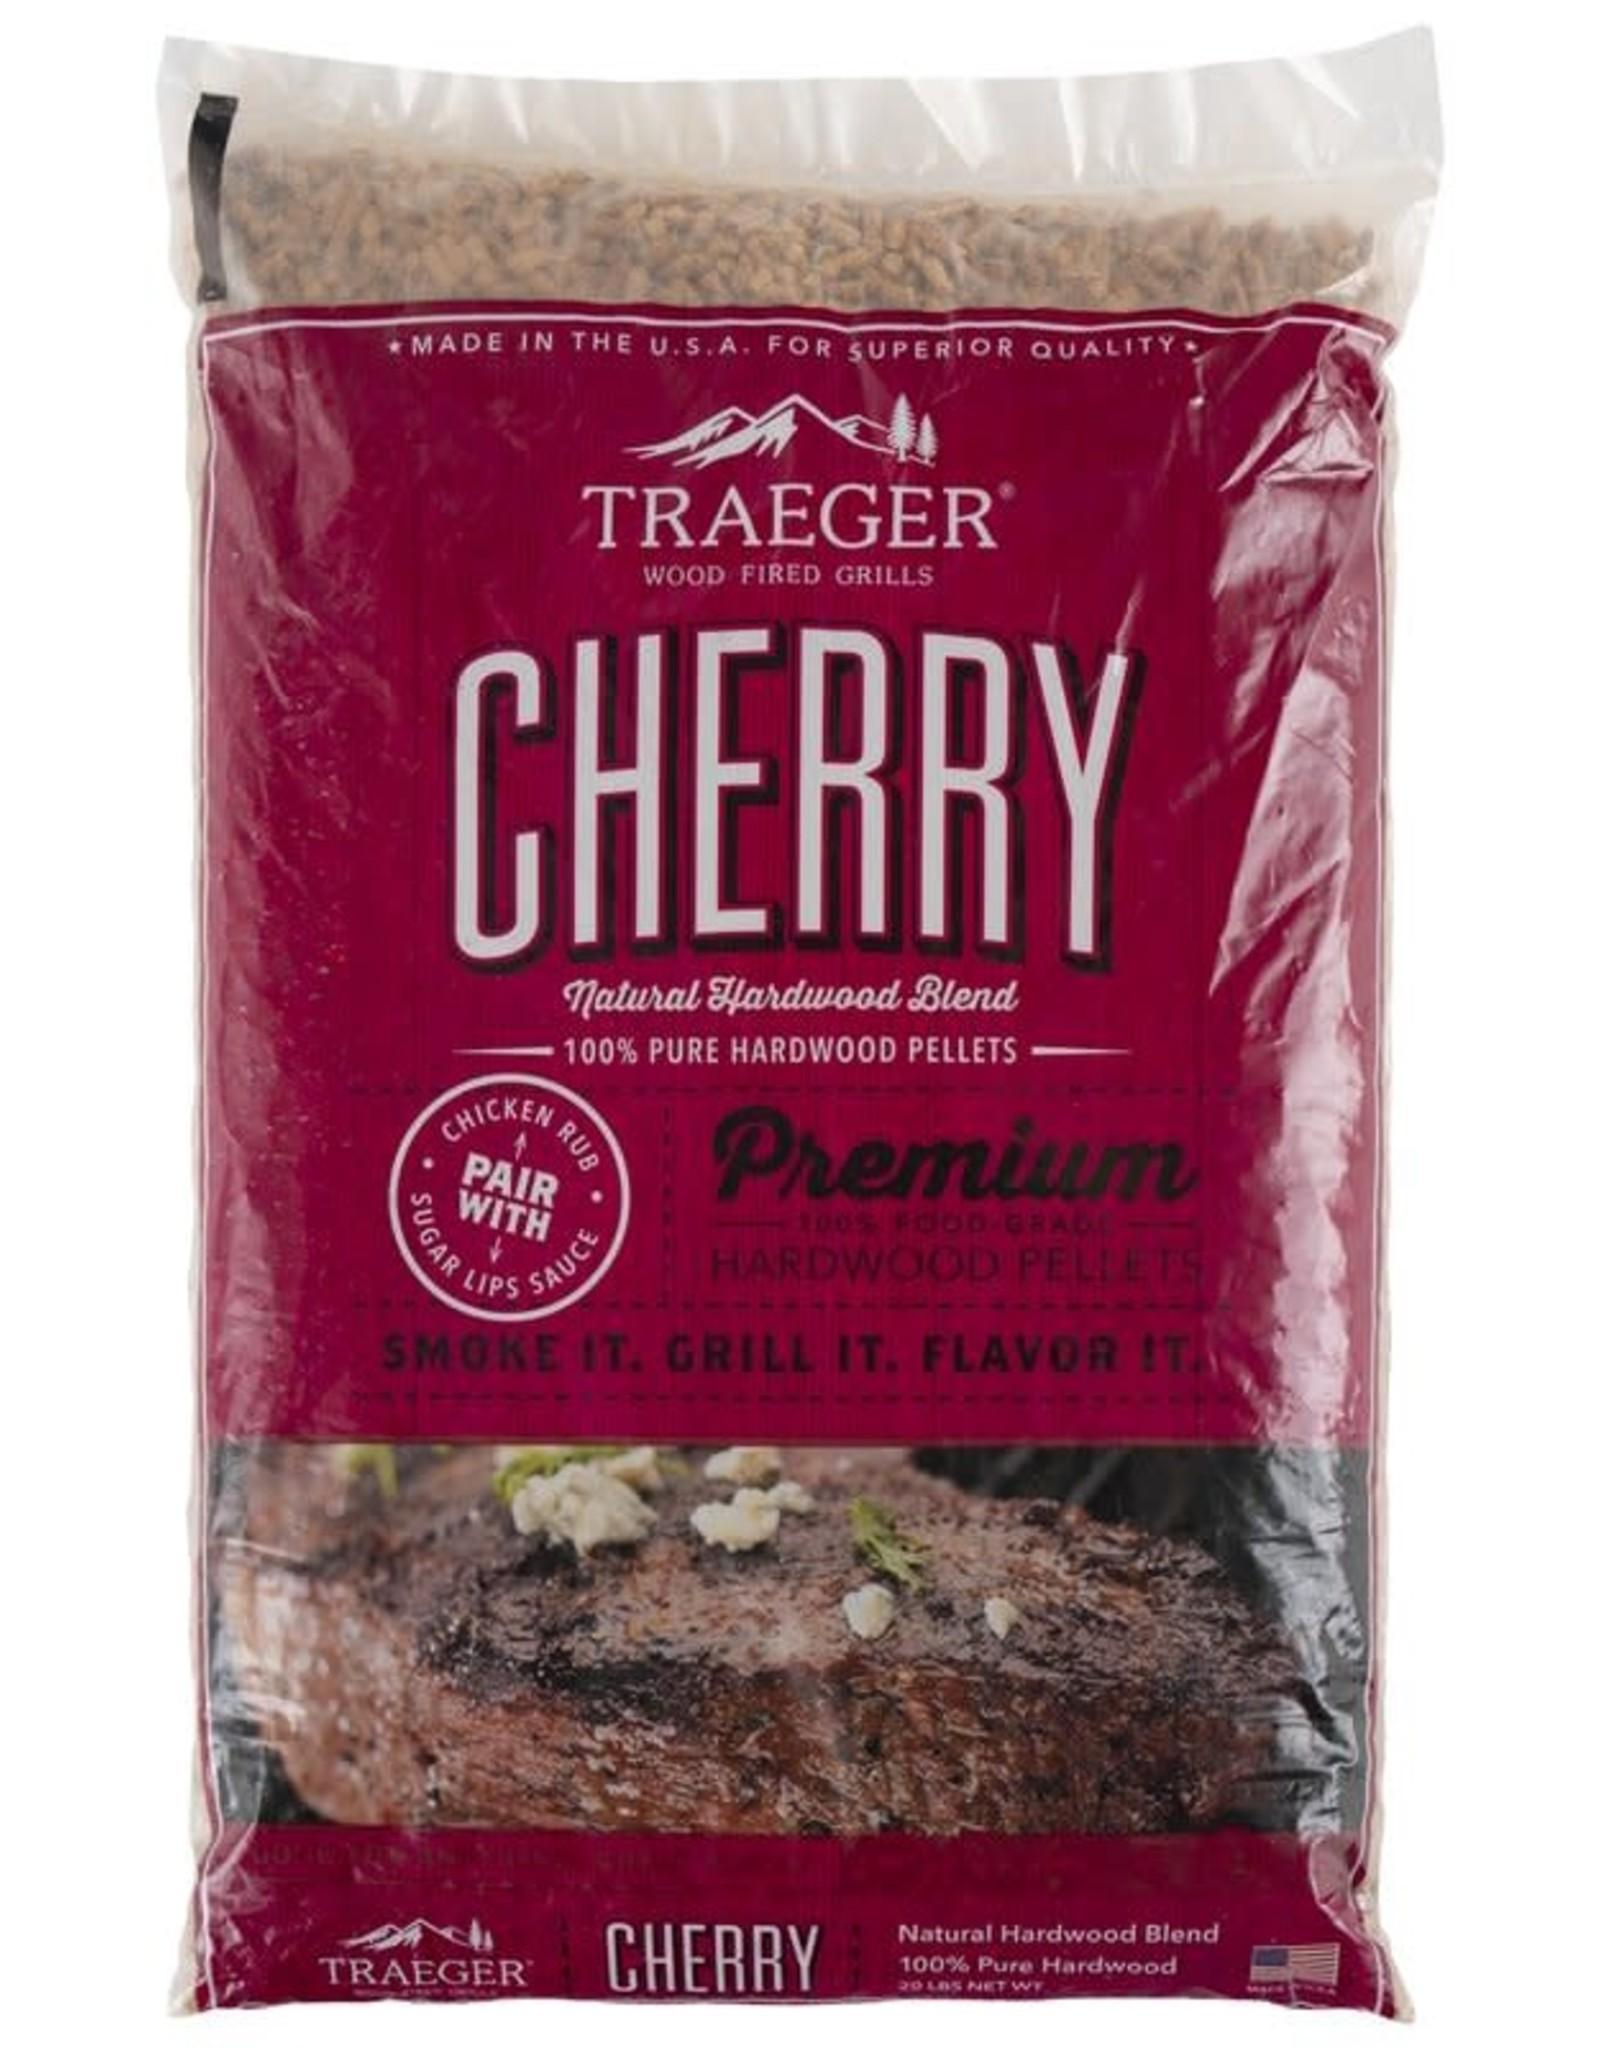 Traeger Traeger 20 Lb. Natural Hardwood Pellets - Cherry